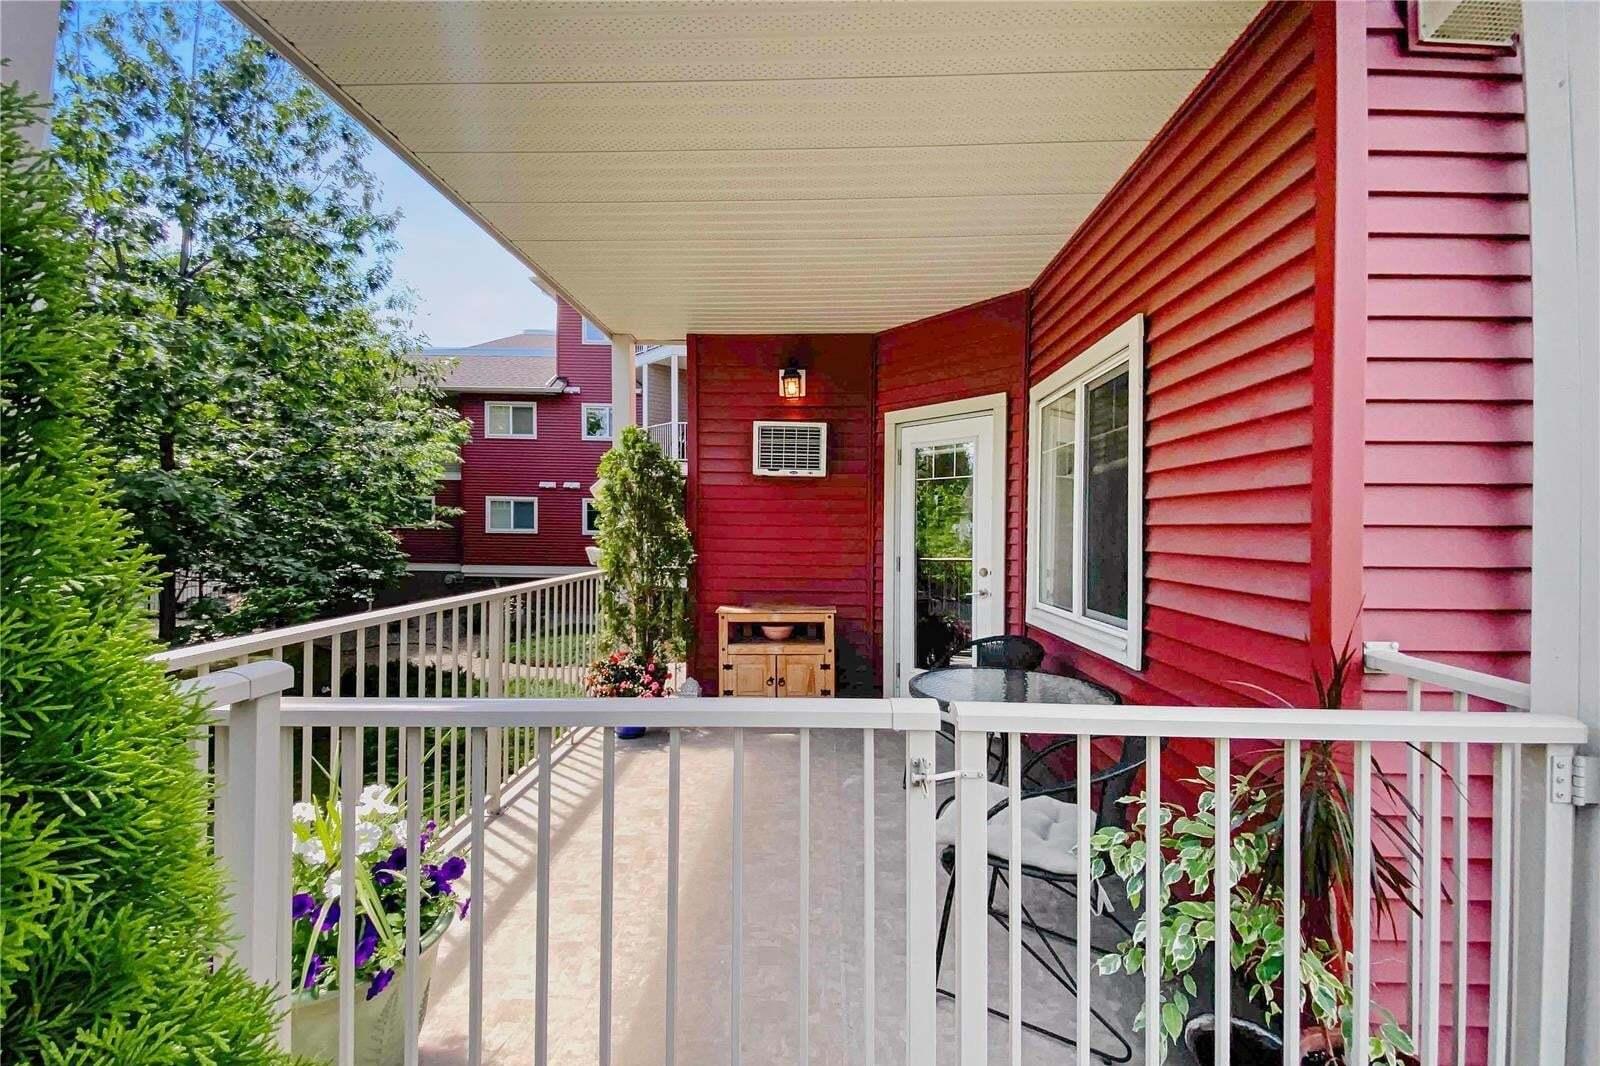 Condo for sale at 345 Mills Rd Kelowna British Columbia - MLS: 10208427